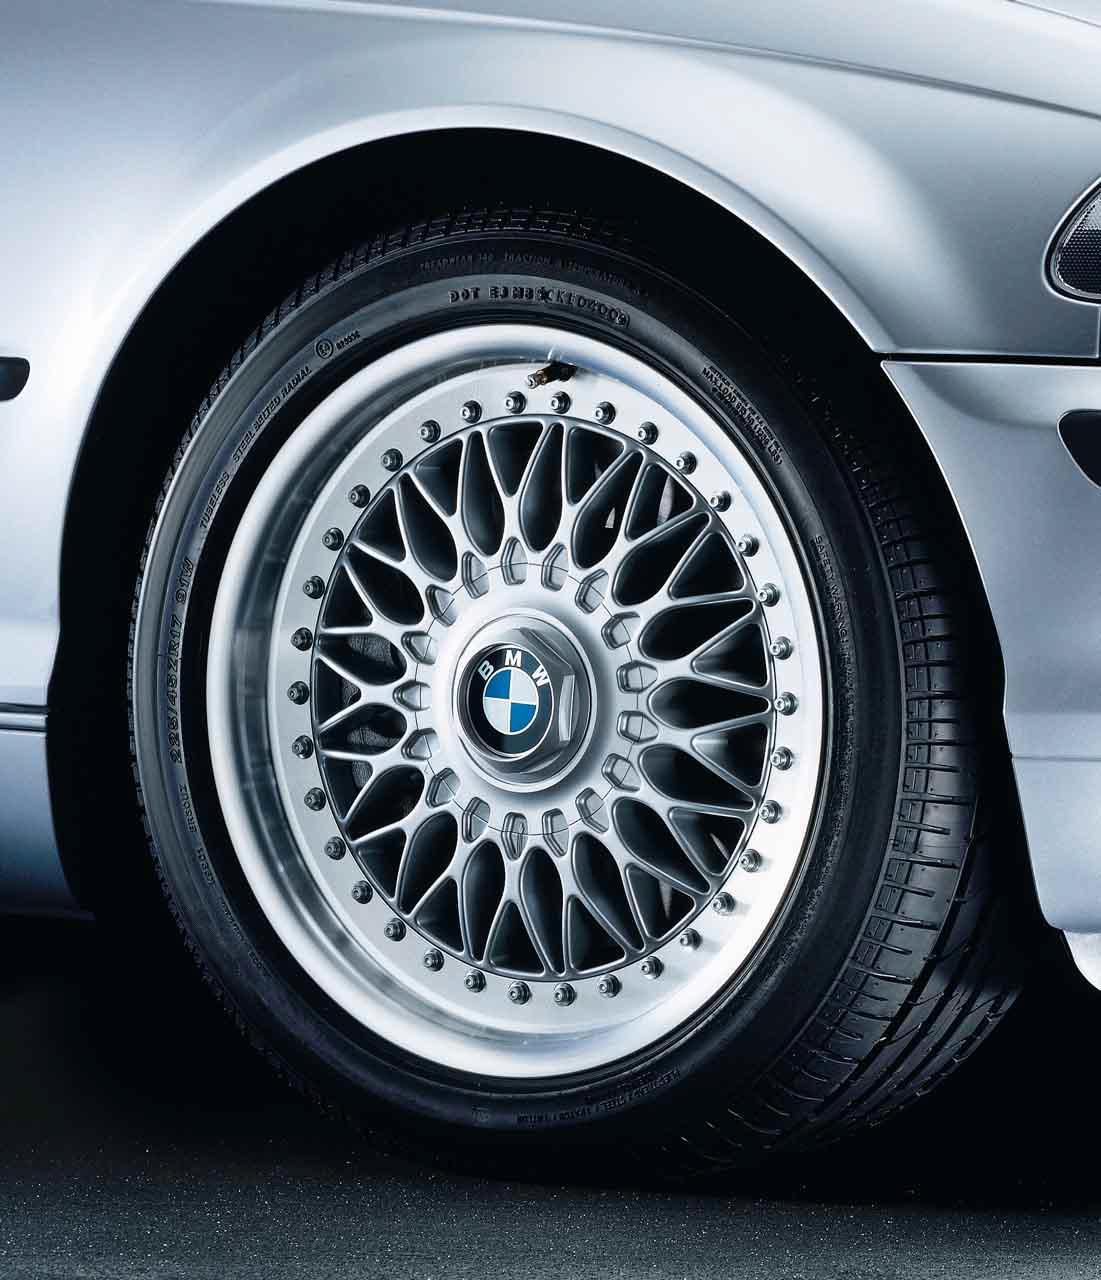 "1x BMW Genuine Alloy Wheel 17"" Cross-Spoke 5 Rim E39 5"